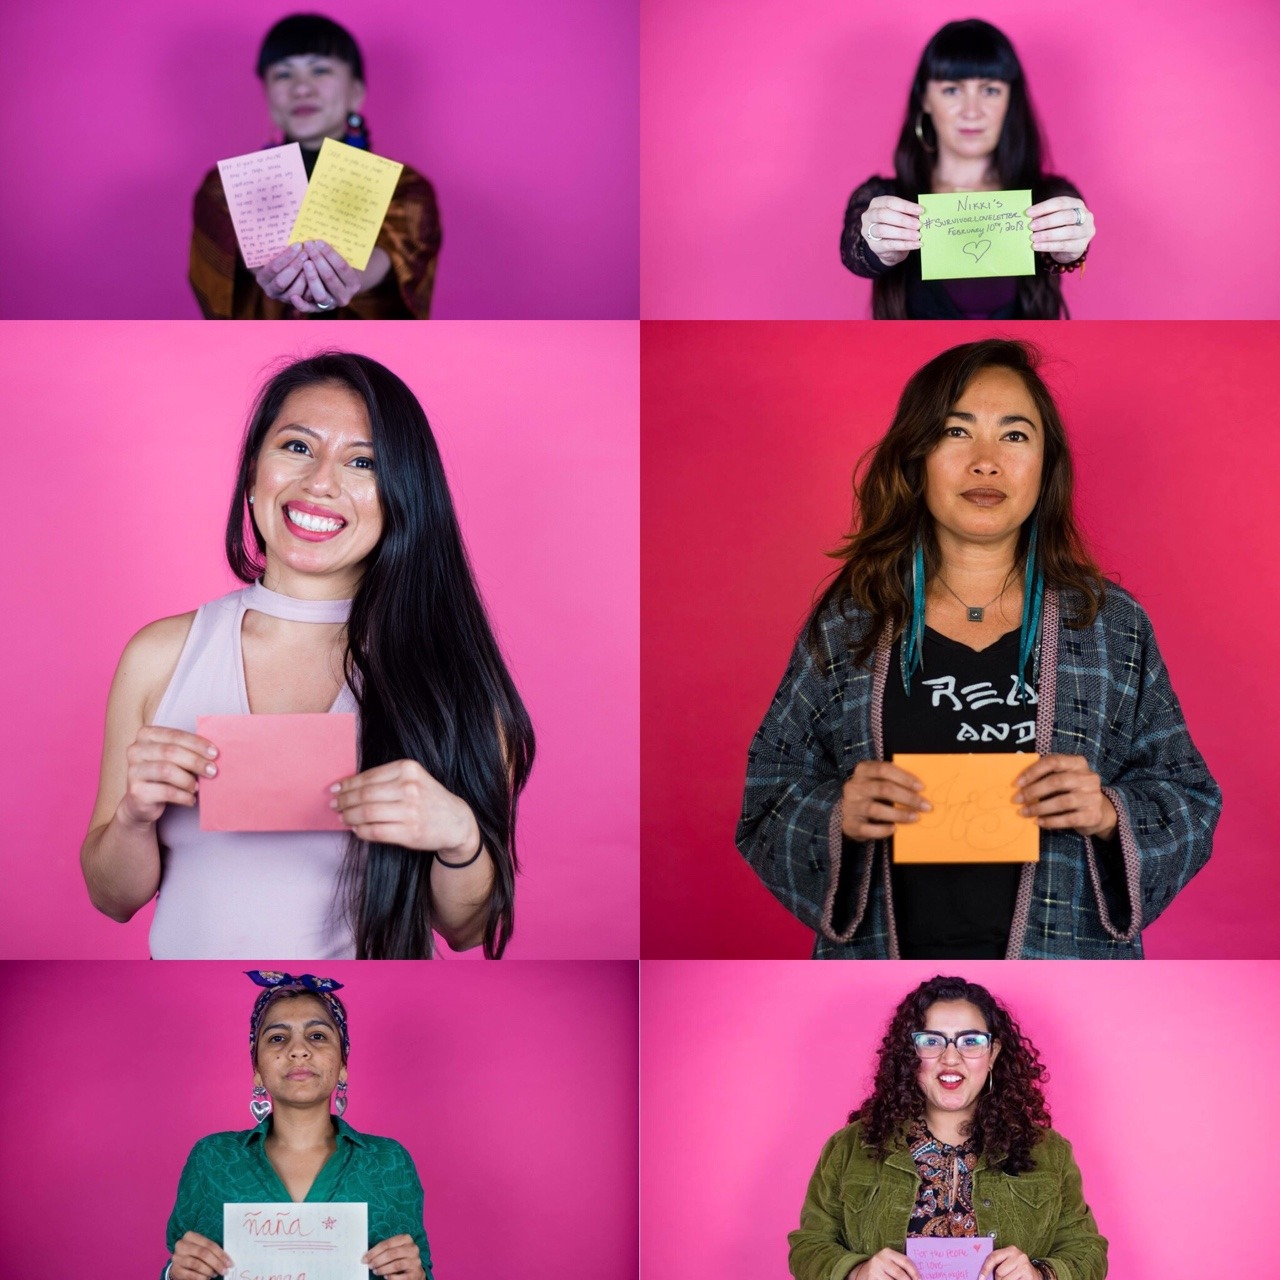 Our first LA #survivorloveletter workshop! Help us flood the internet with love for survivors this feb. 14th.